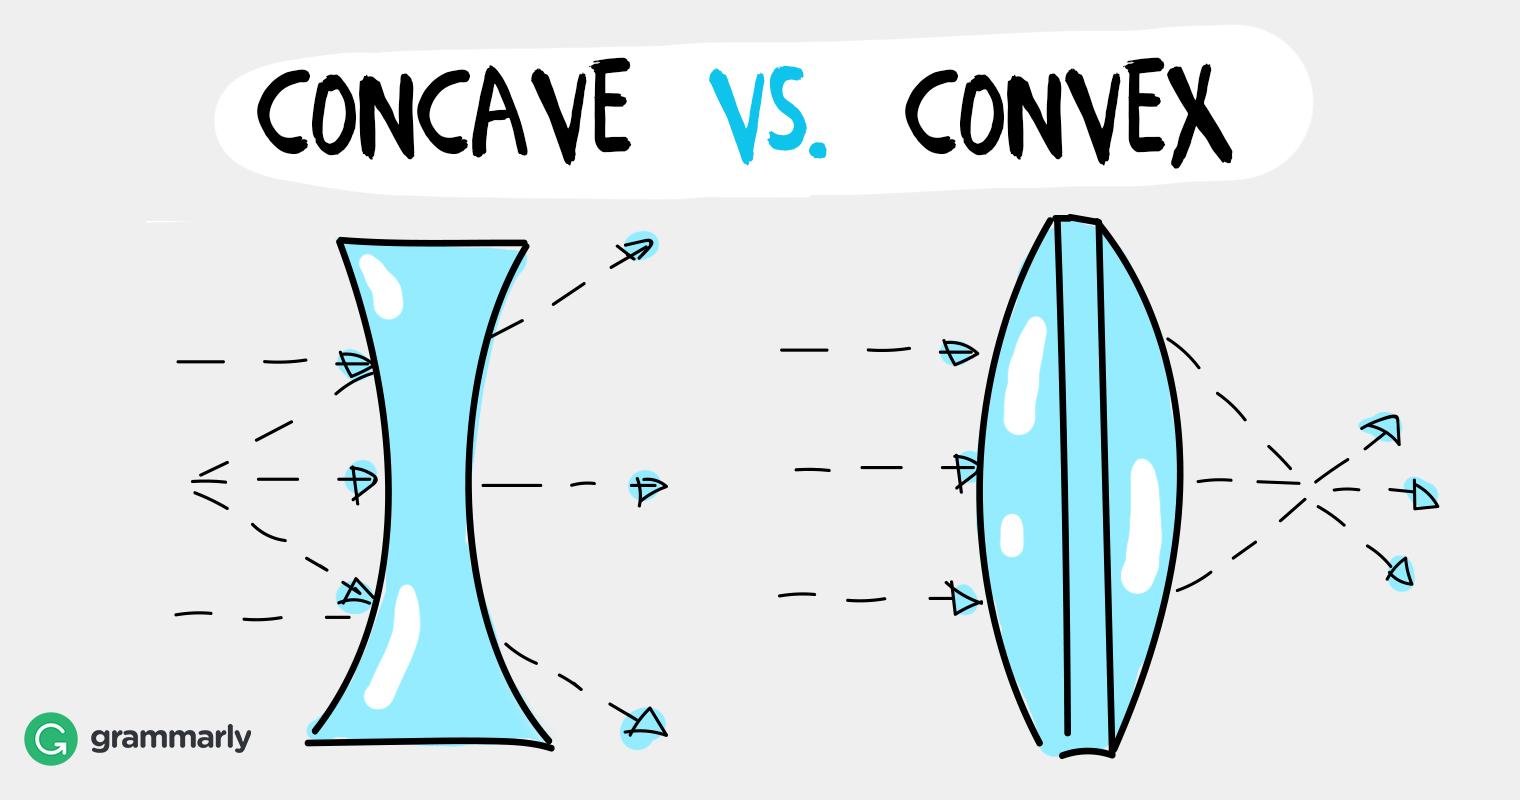 Concave vs. Convex image